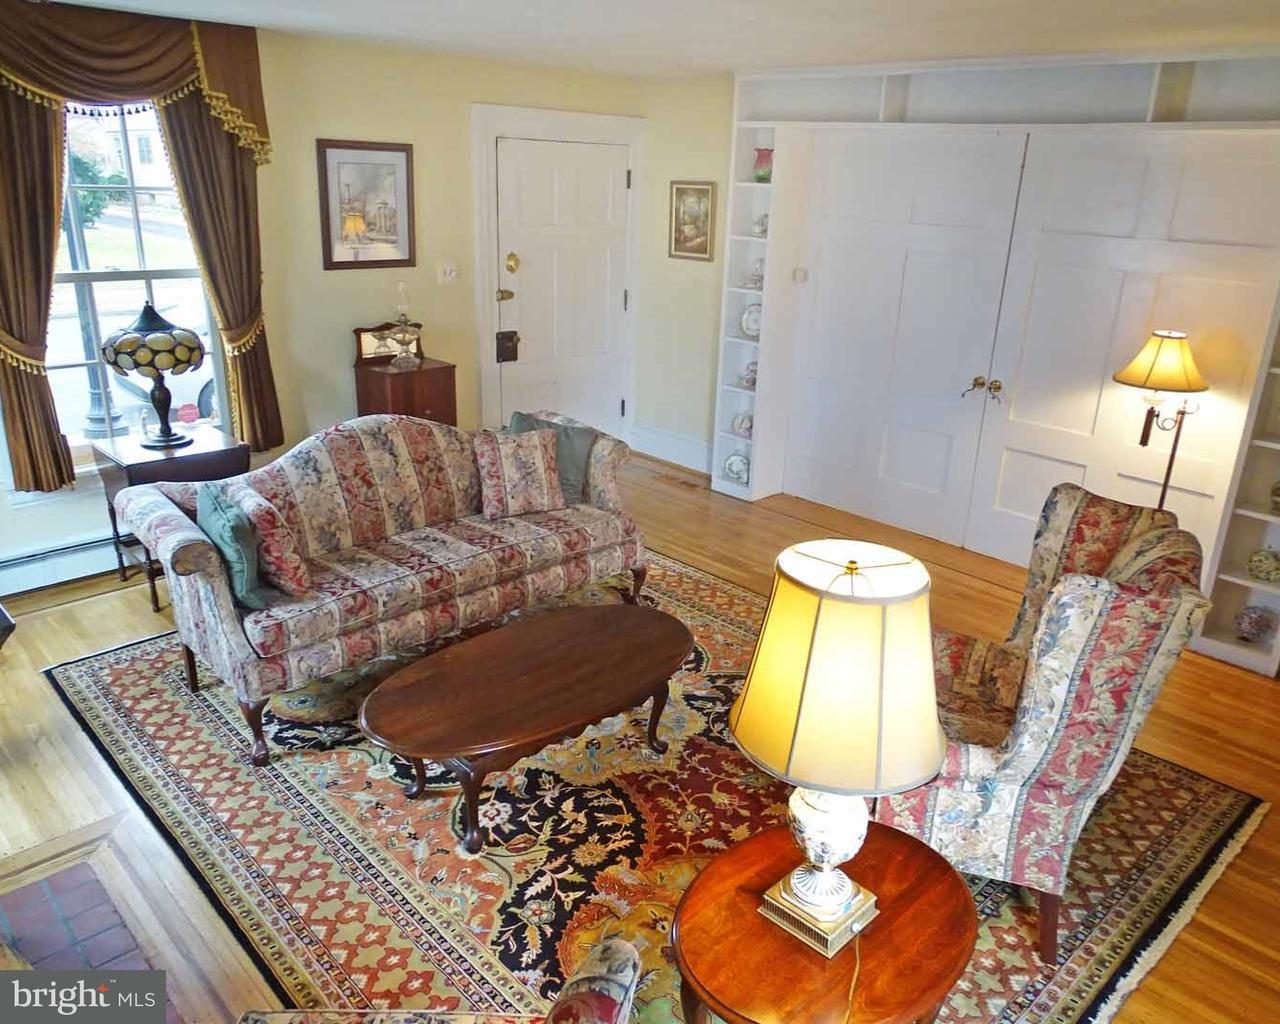 123 W MAPLE AVE, LANGHORNE - Listed at $425,000, LANGHORNE